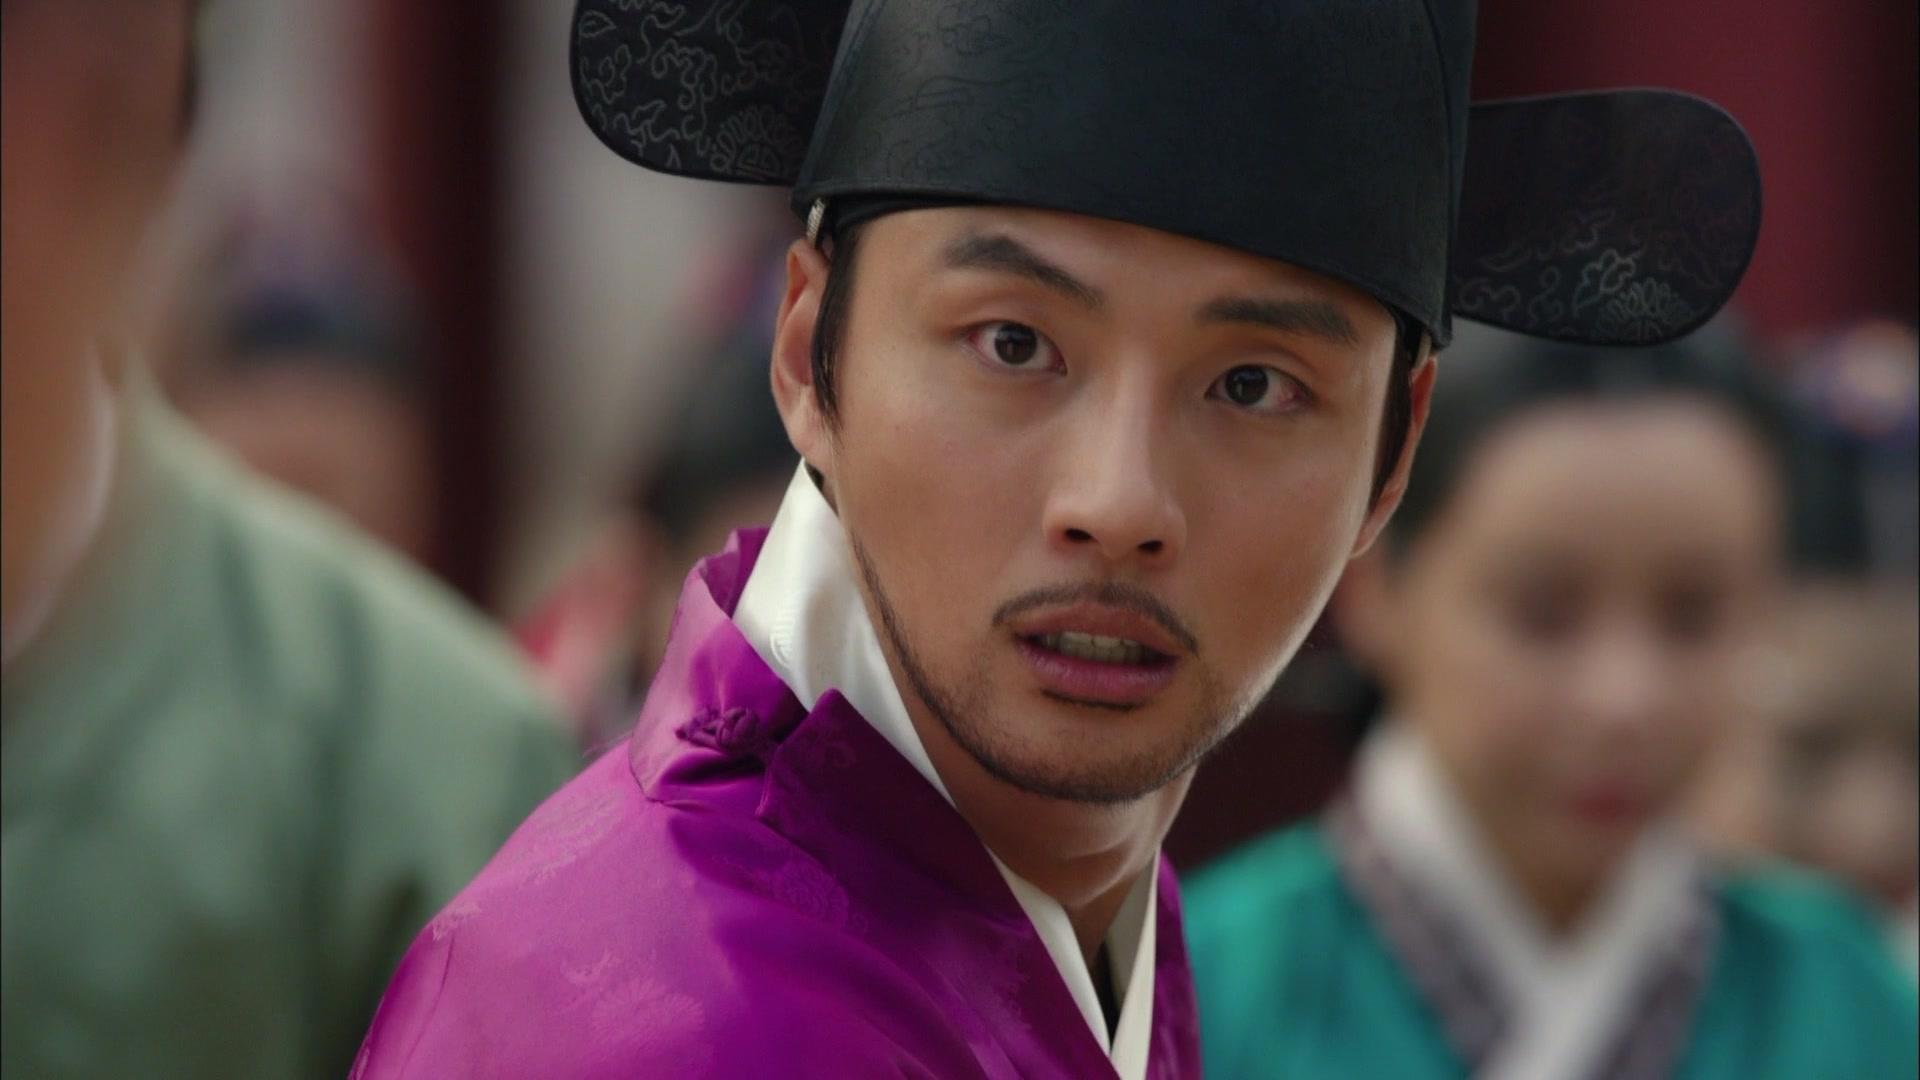 Grand Prince Episode 11